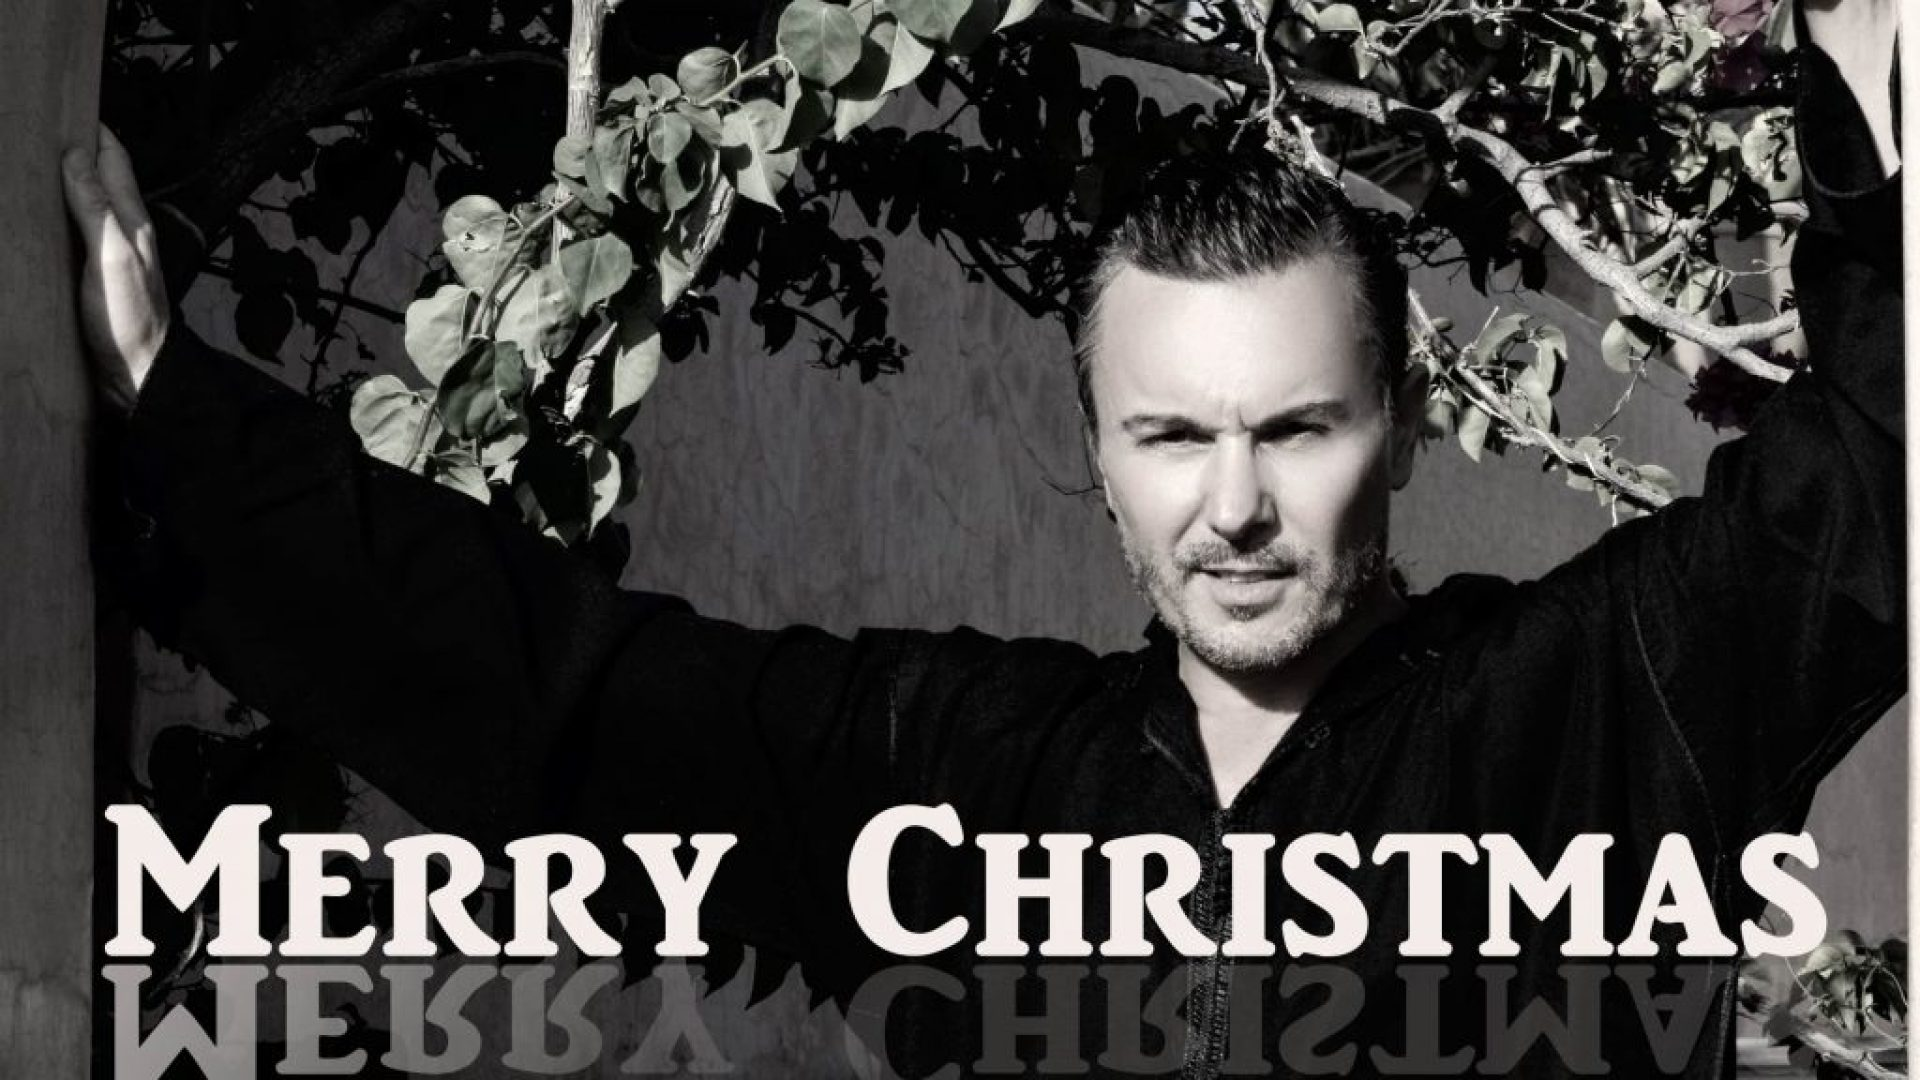 alessandro_cipriano_marrakech_black_merry_christmas-min